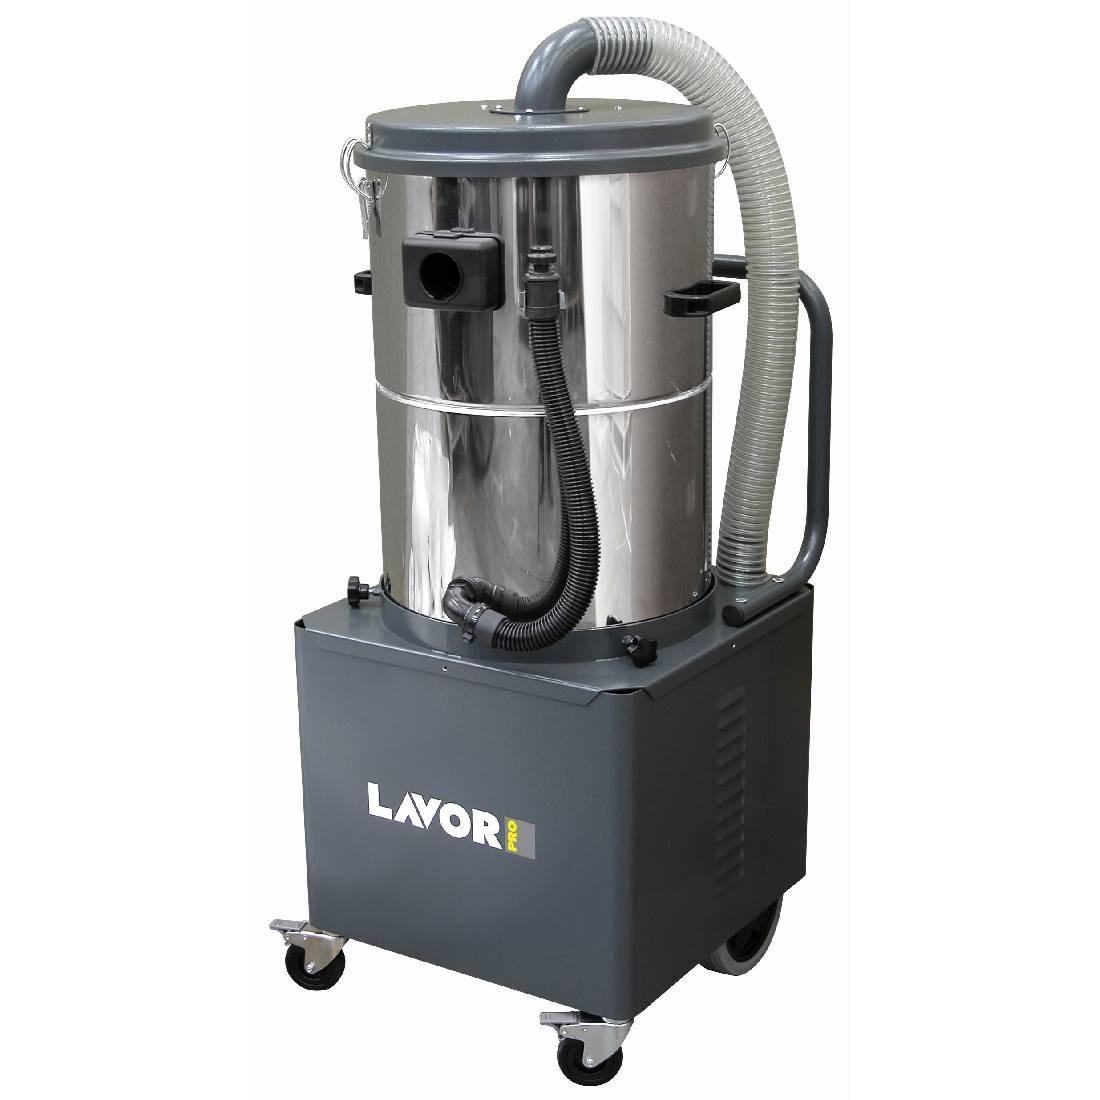 Пылеводосос Lavor Pro DTX 80 1-30 S